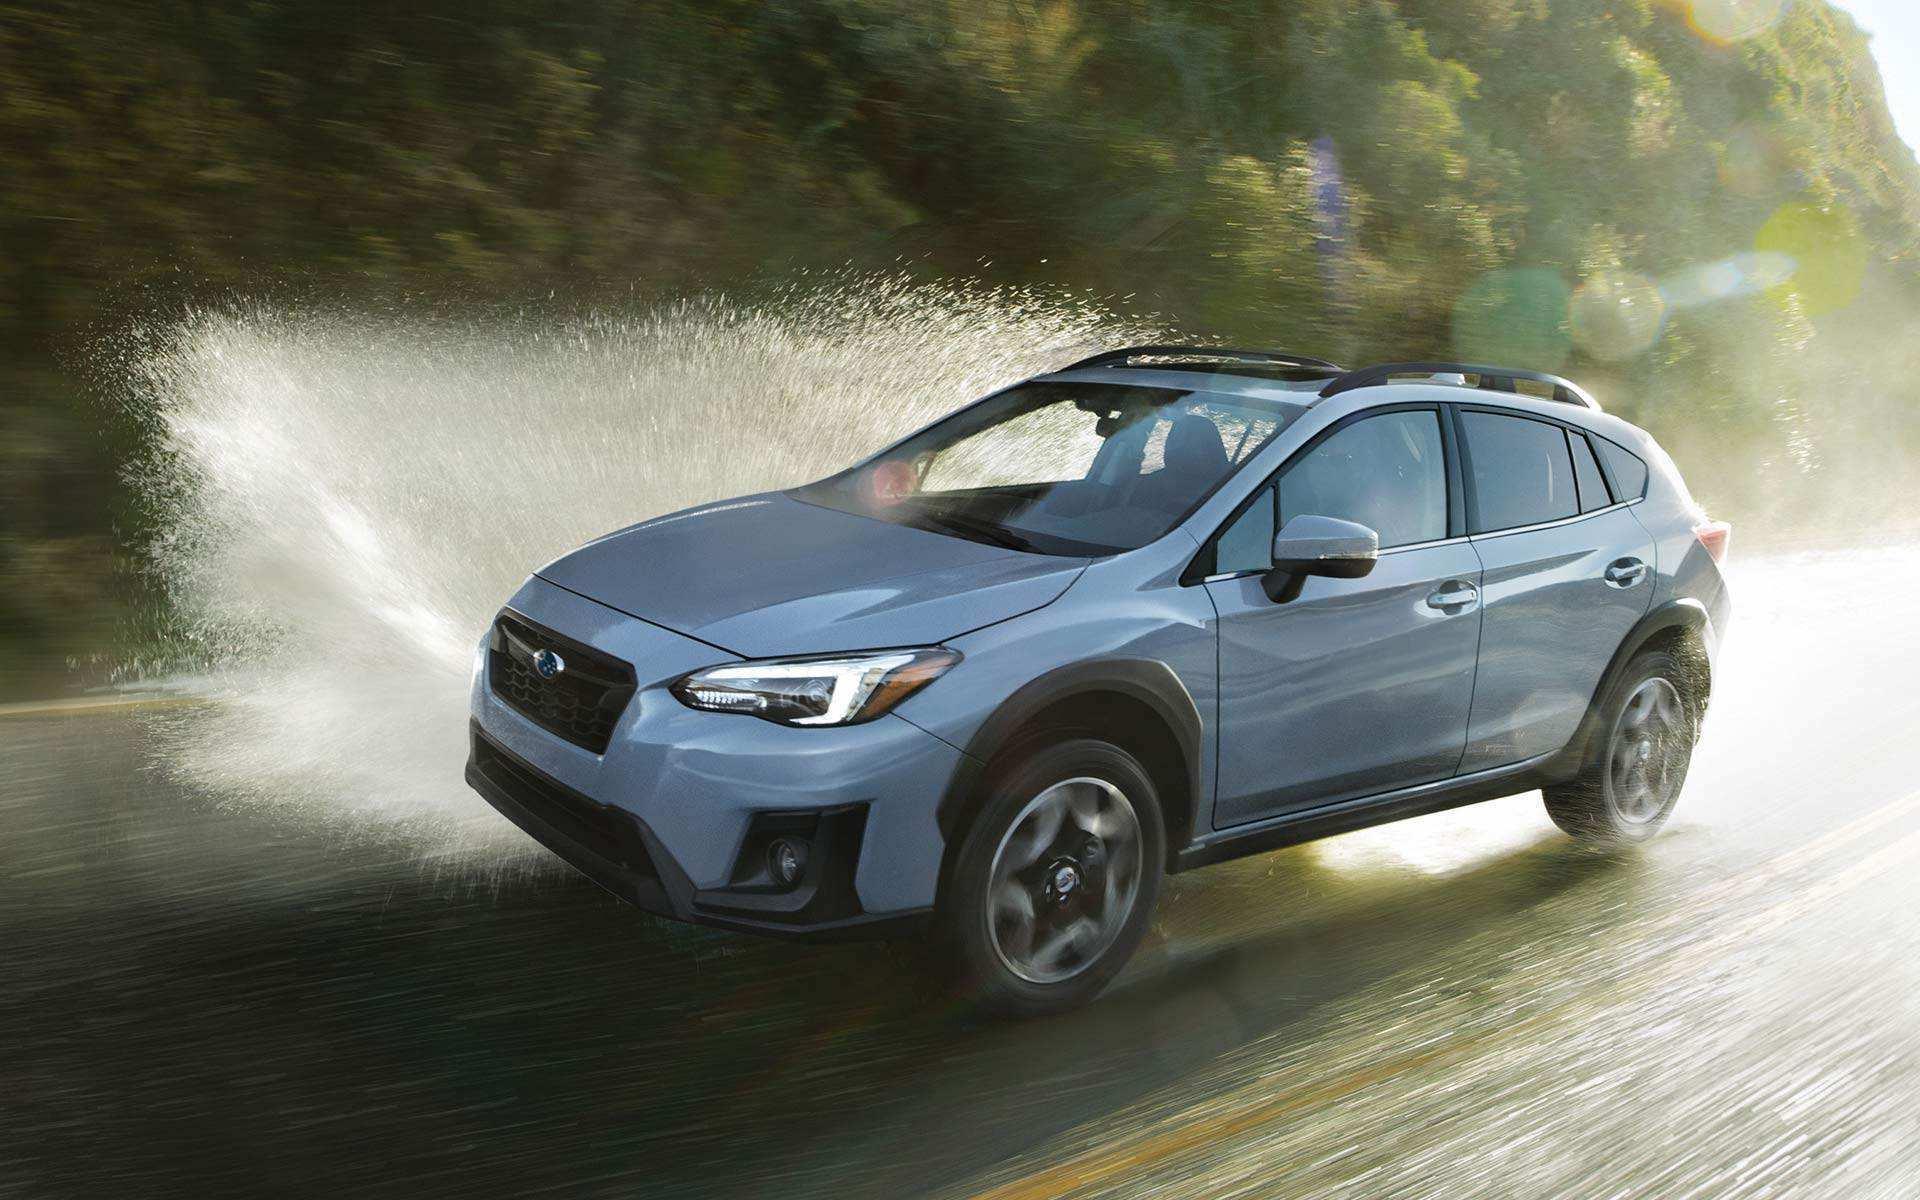 46 New The 2019 Subaru Hybrid Mpg Release Date Rumors for The 2019 Subaru Hybrid Mpg Release Date